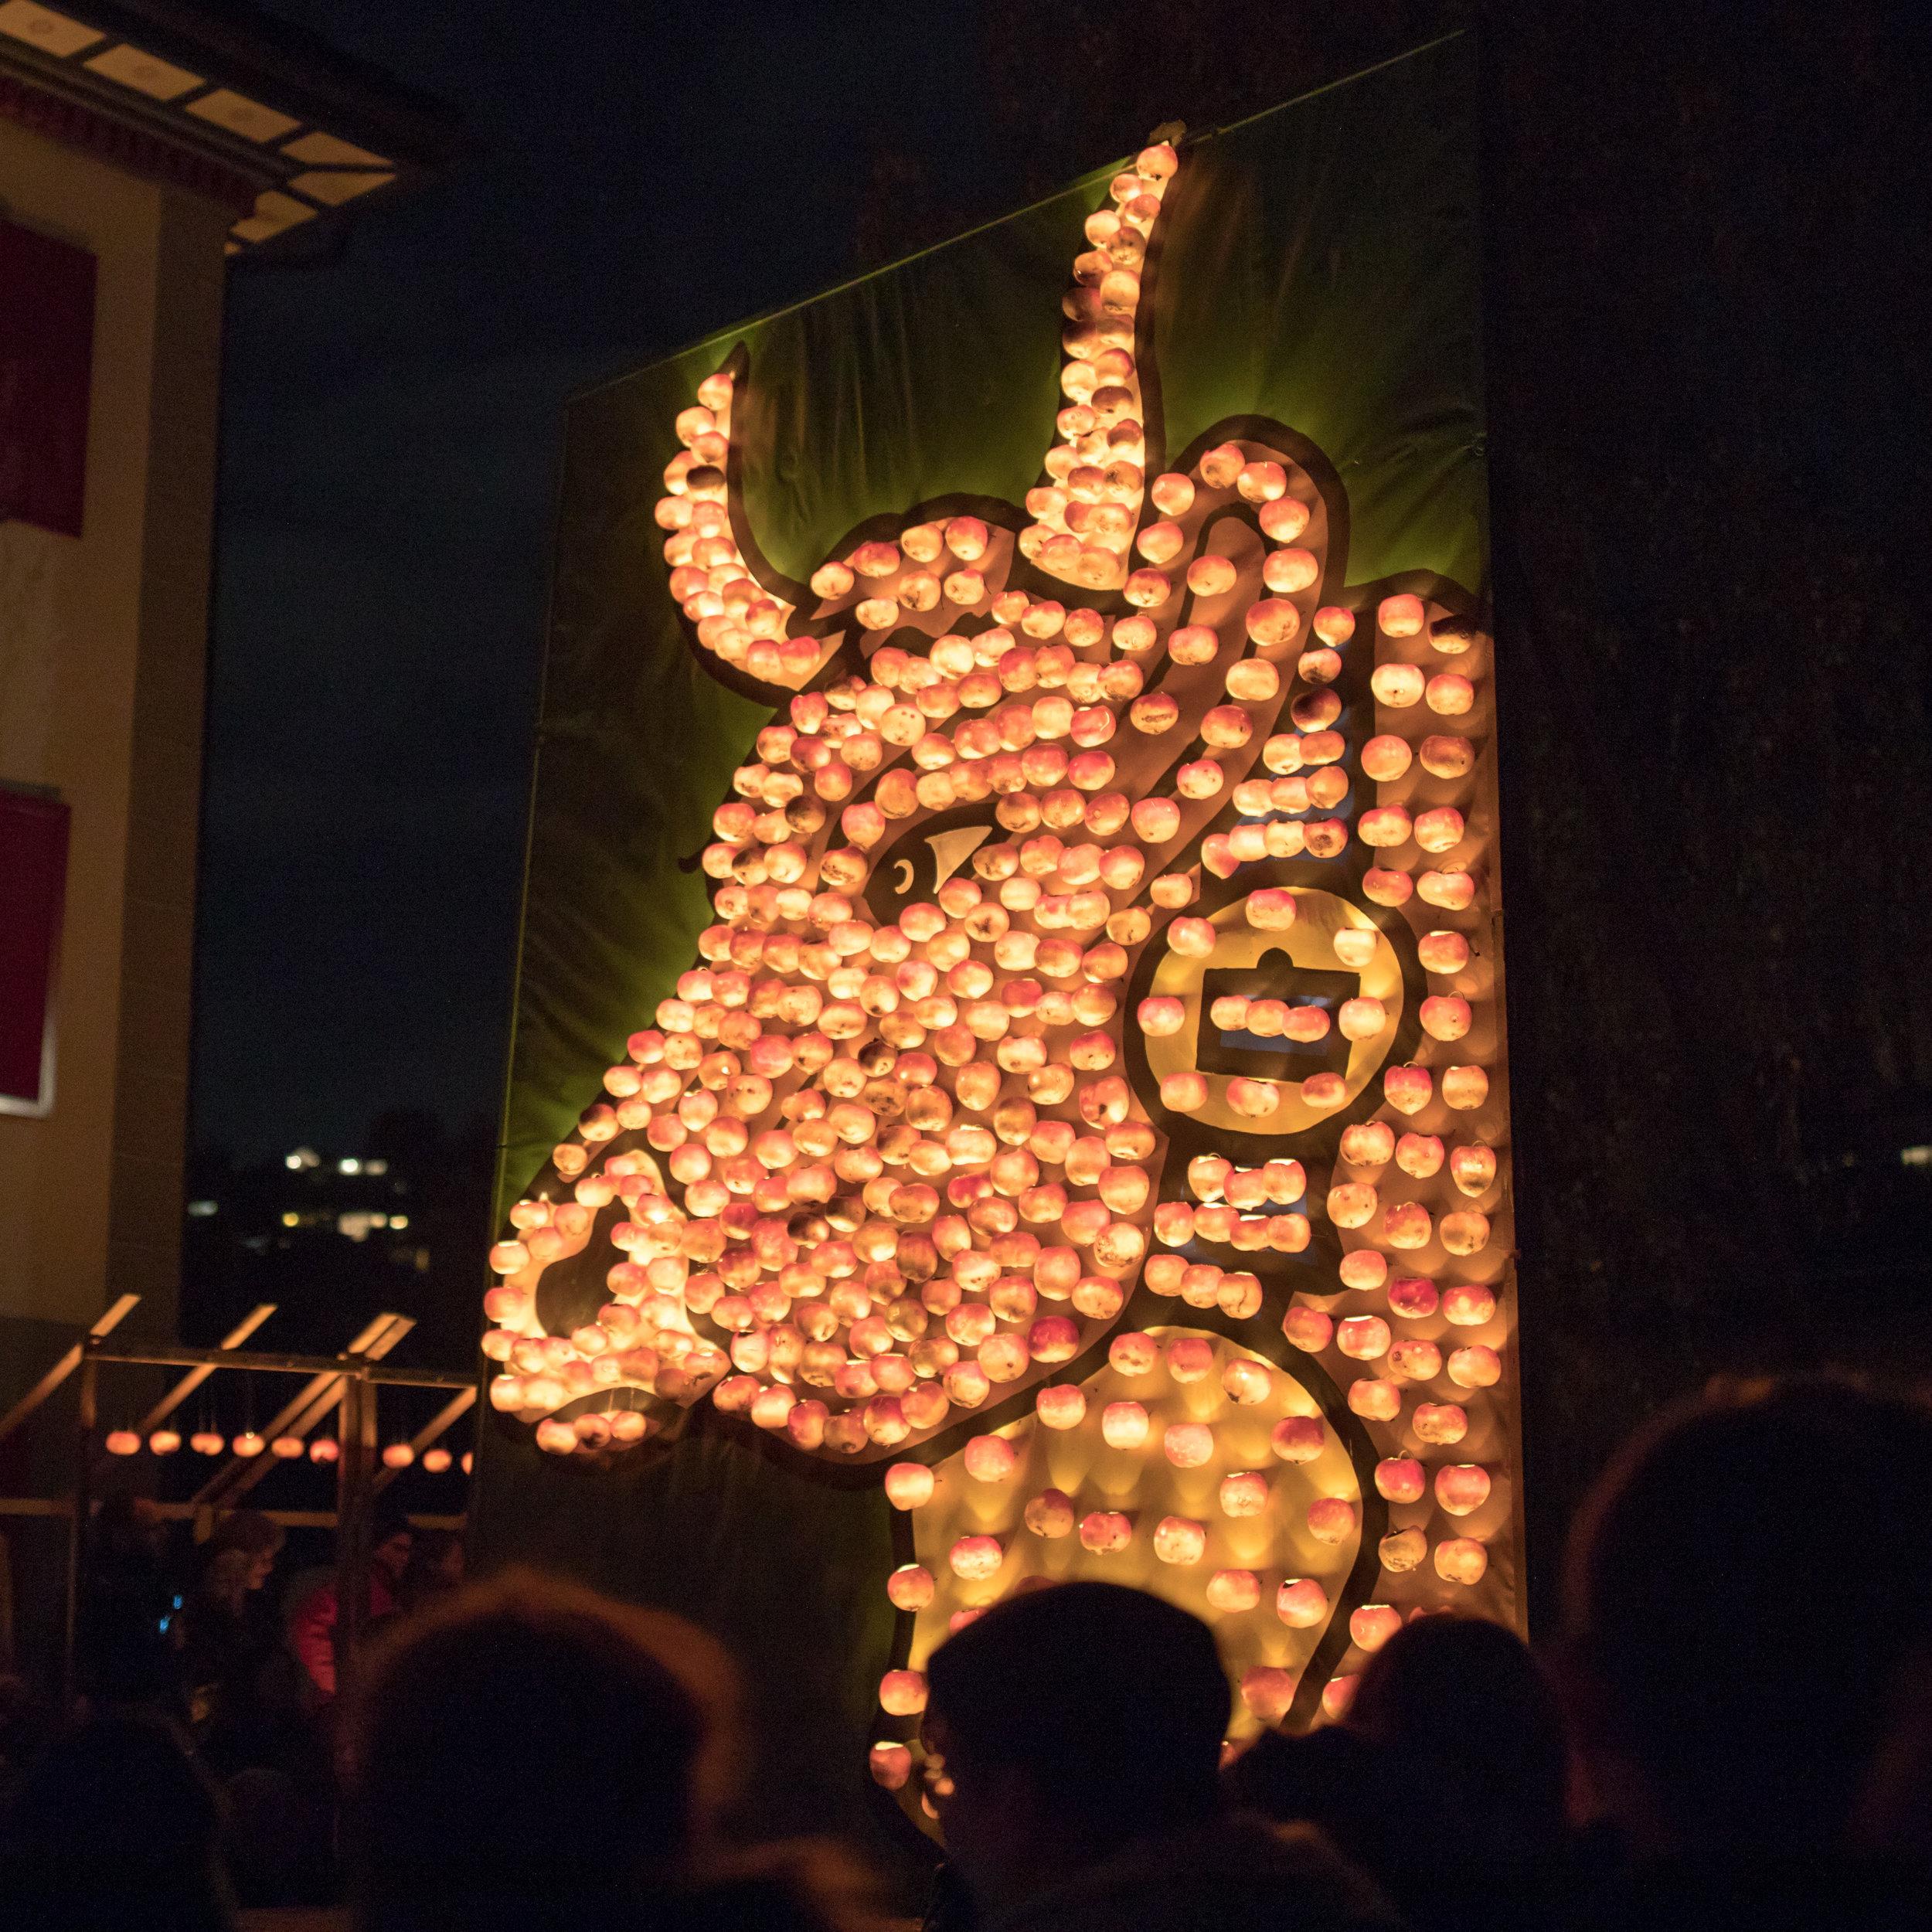 turnip-festival-parade-cow-richterswil-switzerland.jpg.jpg